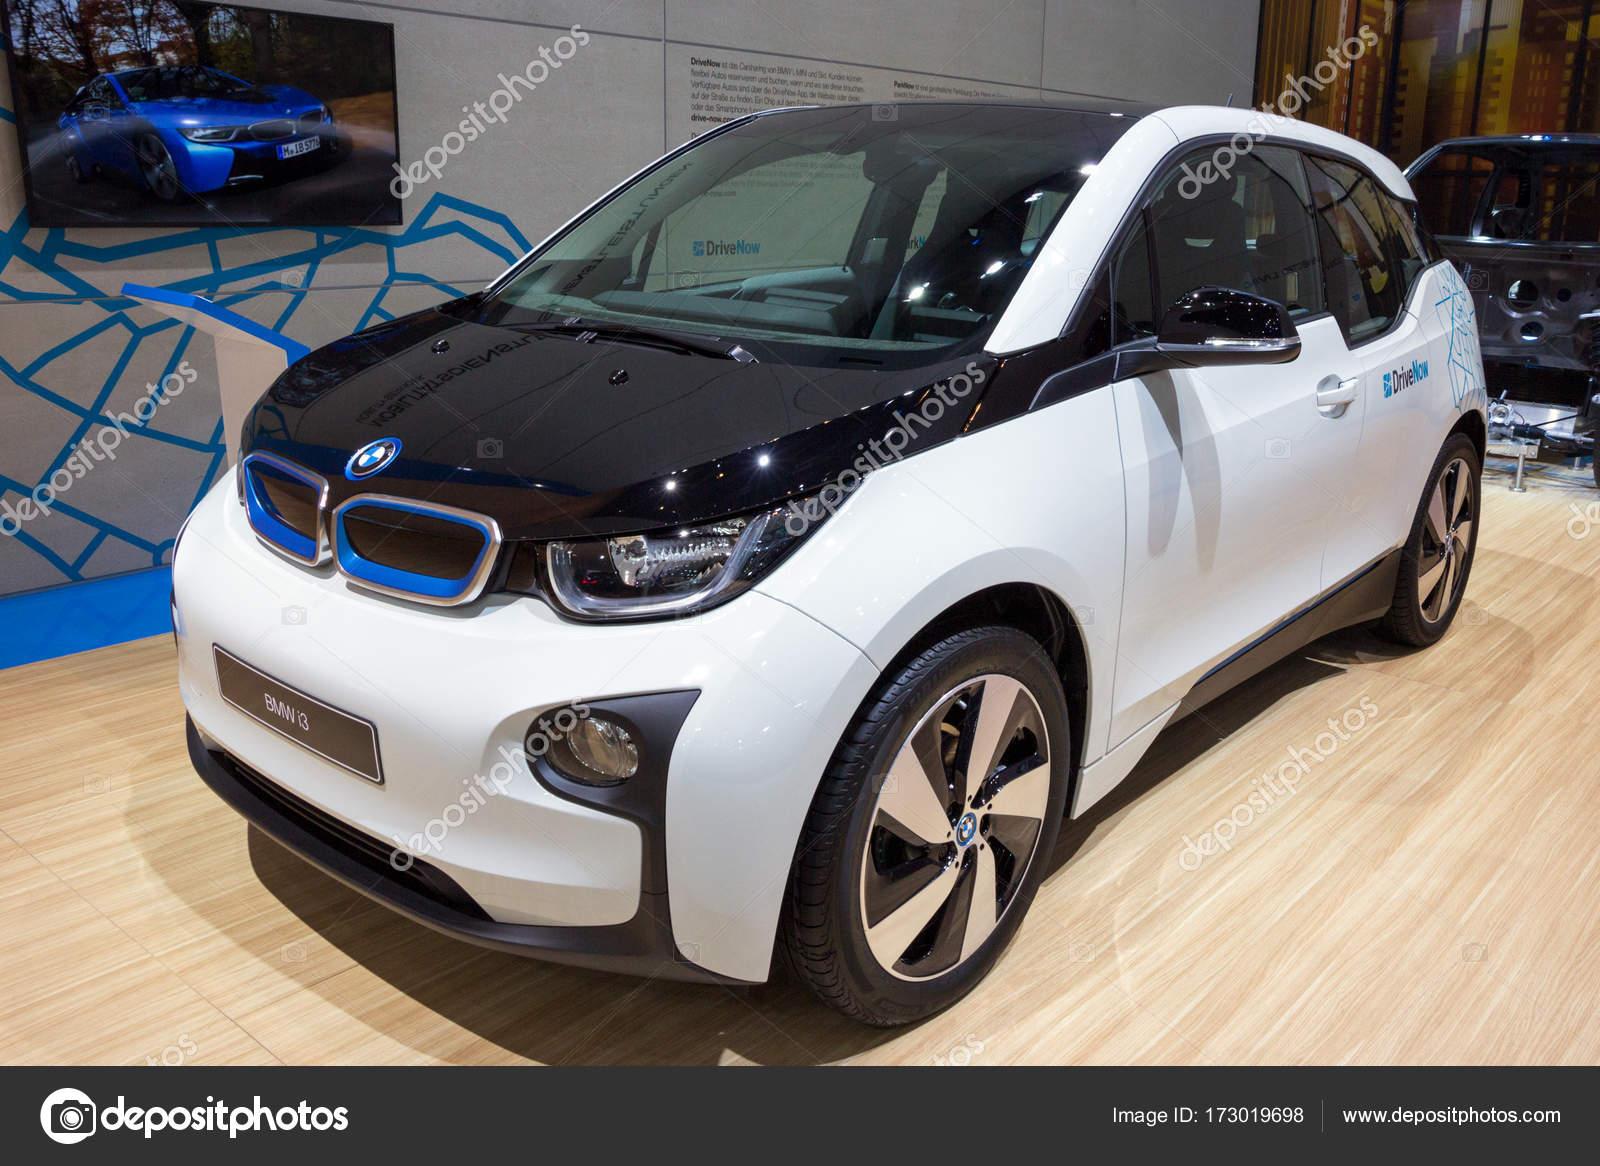 tribune bmw electric auto upgrade range battery boosts articles car financial economy